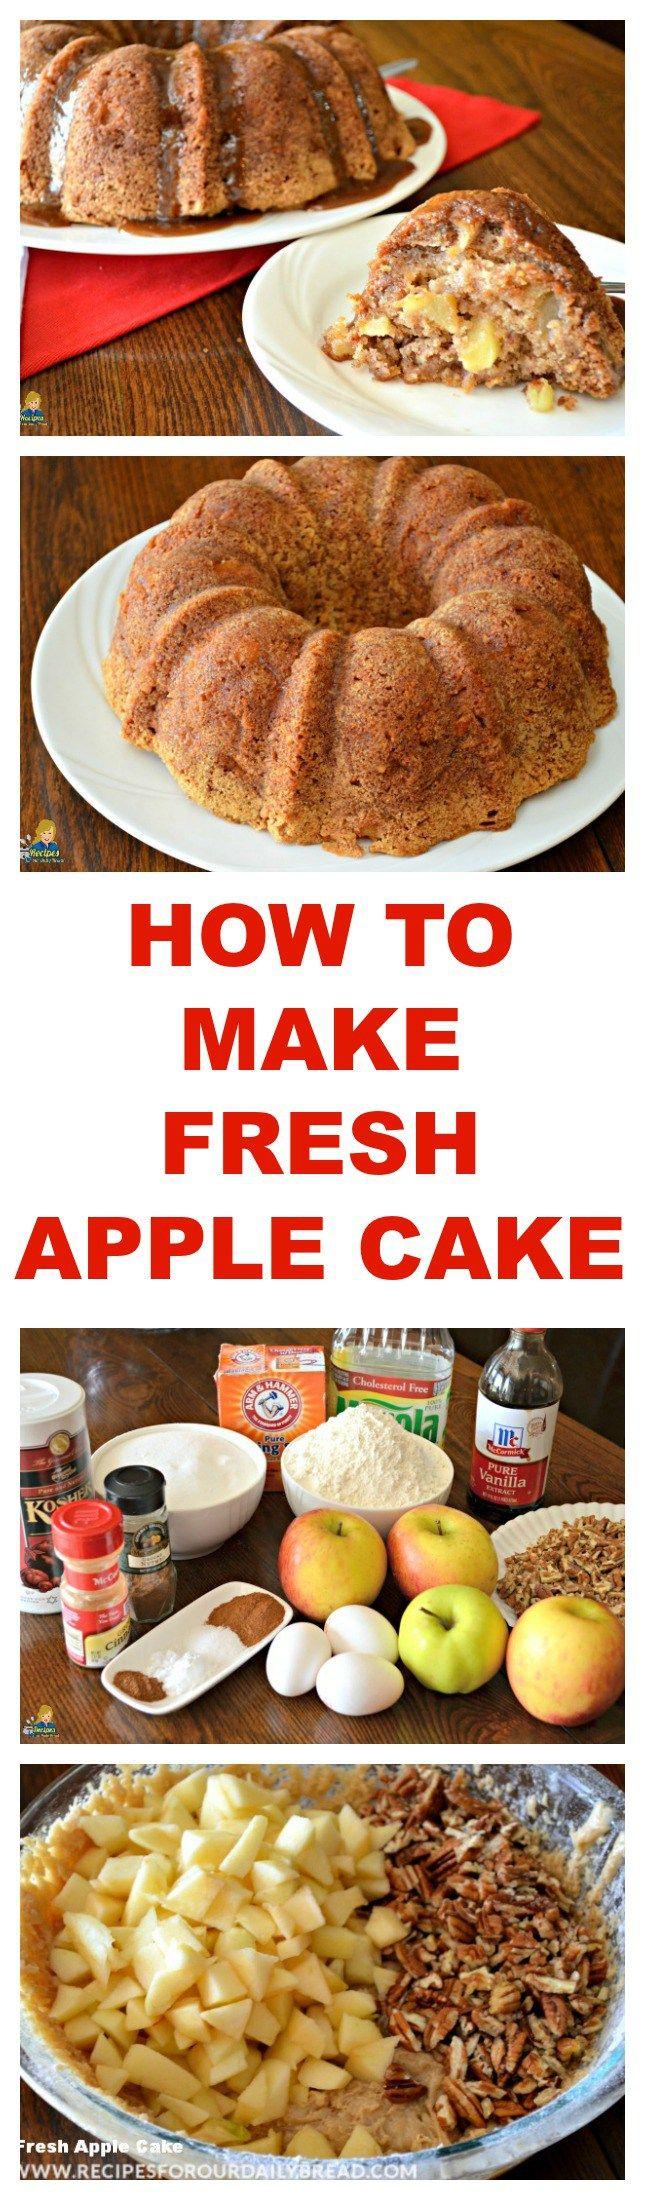 HOW TO MAKE MOISTEST FRESH APPLE CAKE  PRINT RECIPE HERE: http://recipesforourdailybread.com/make-moistest-fresh-apple-cake/